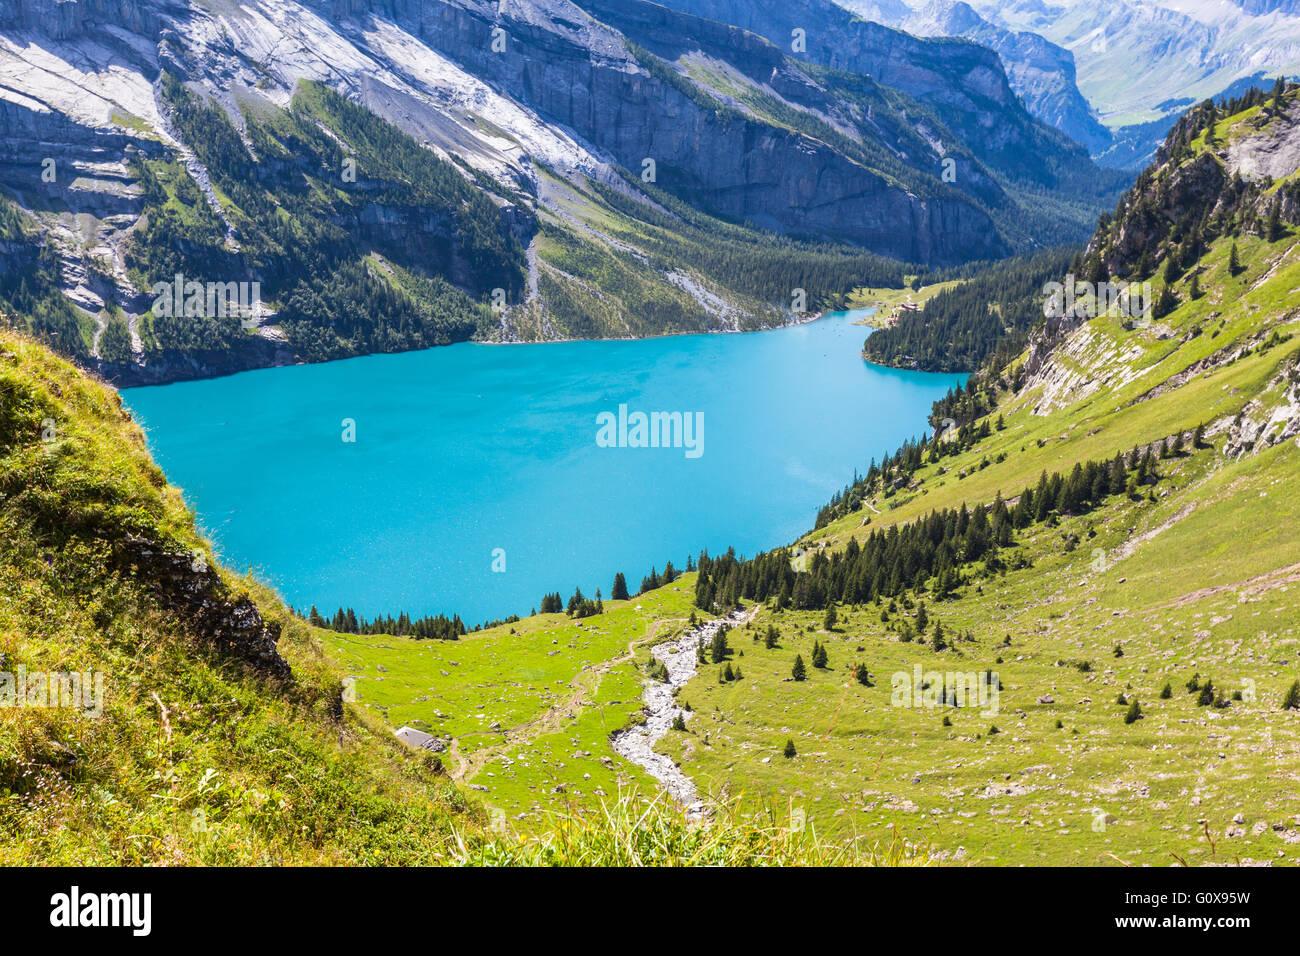 View of the Oeschinensee (Oeschinen lake) near Kandersteg on bernese oberland in Switzerland. - Stock Image